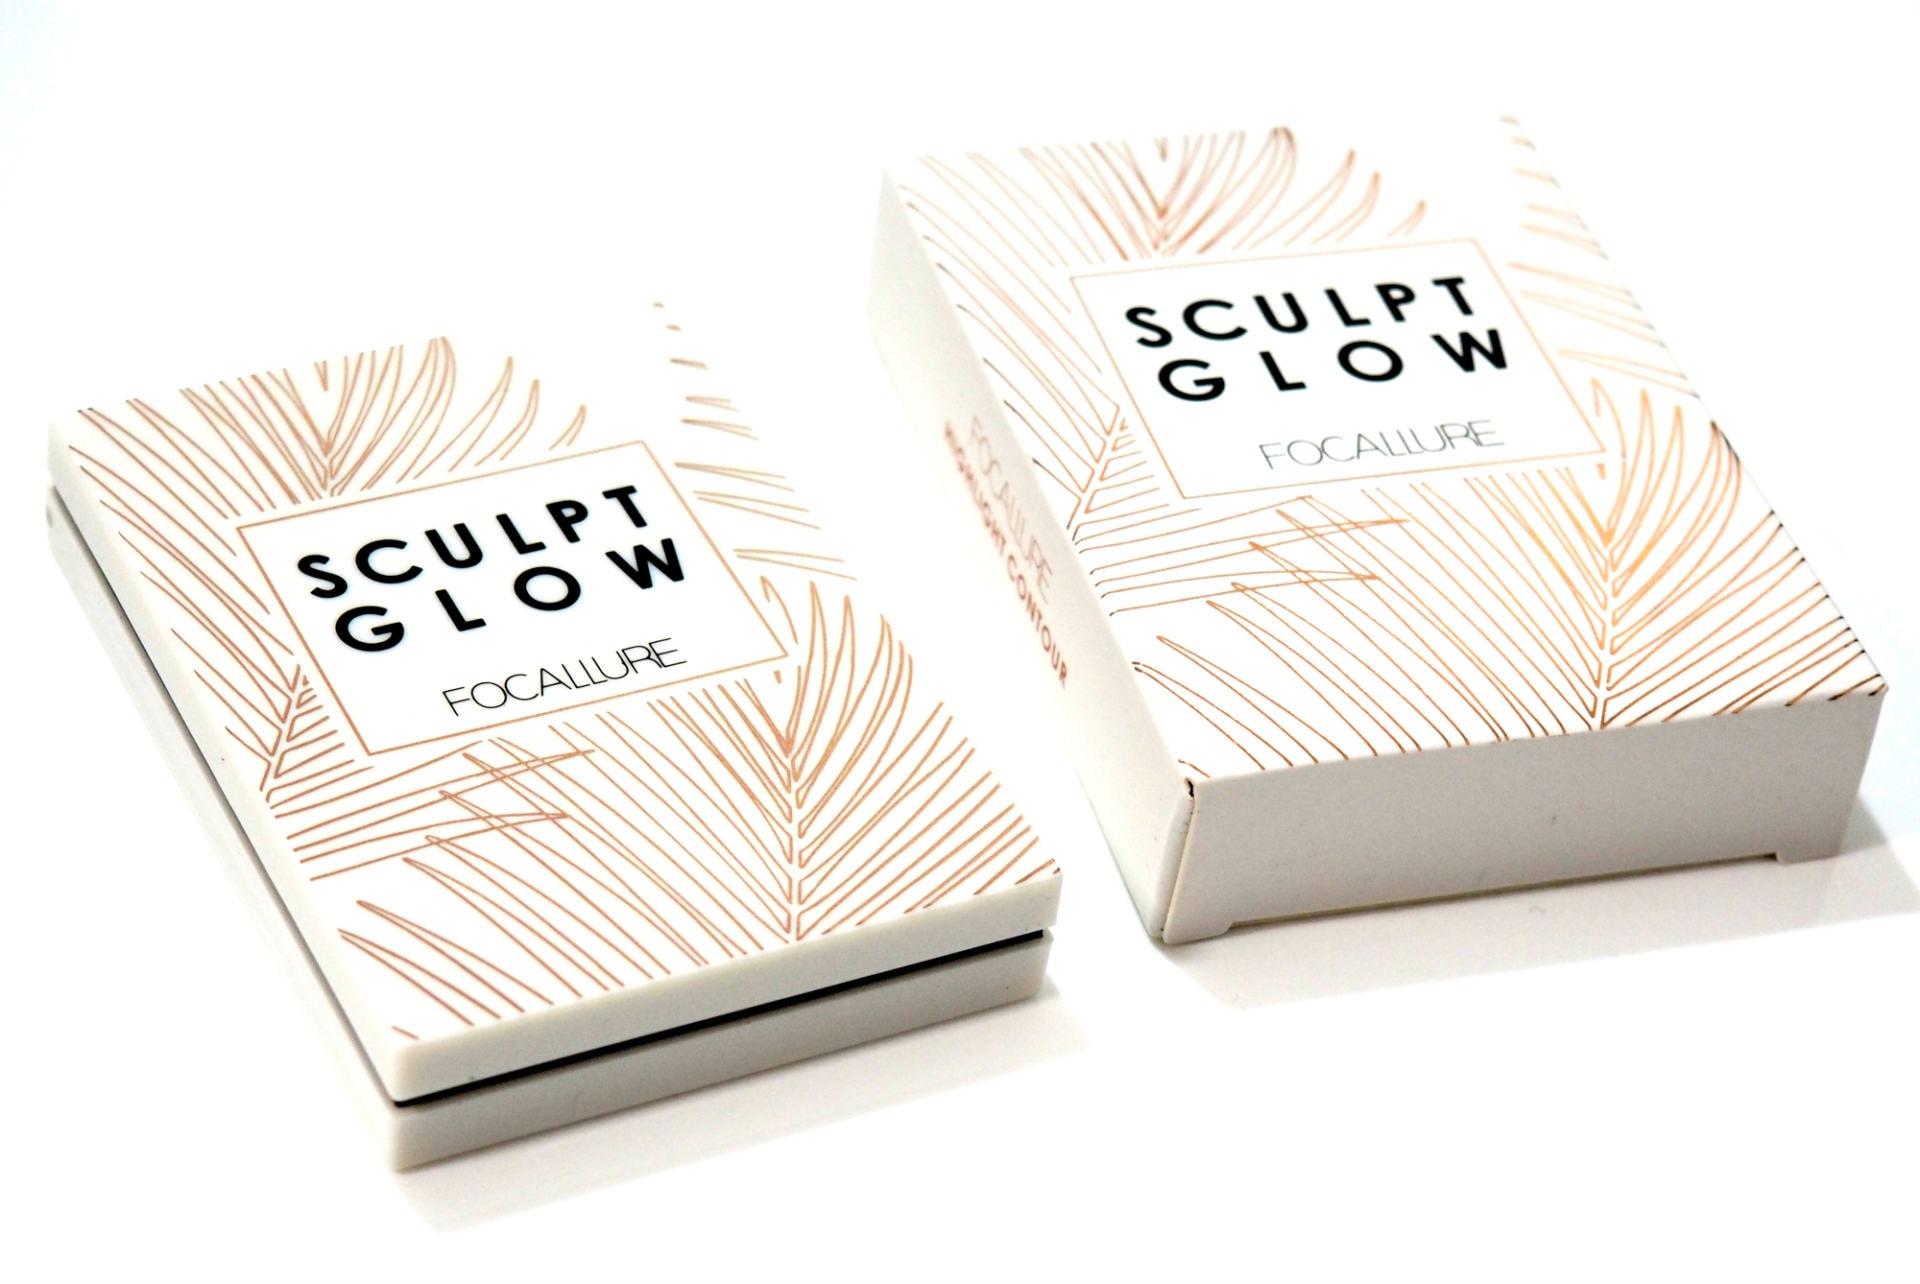 Focallure Sculpt Glow Contour and Highlight Duo